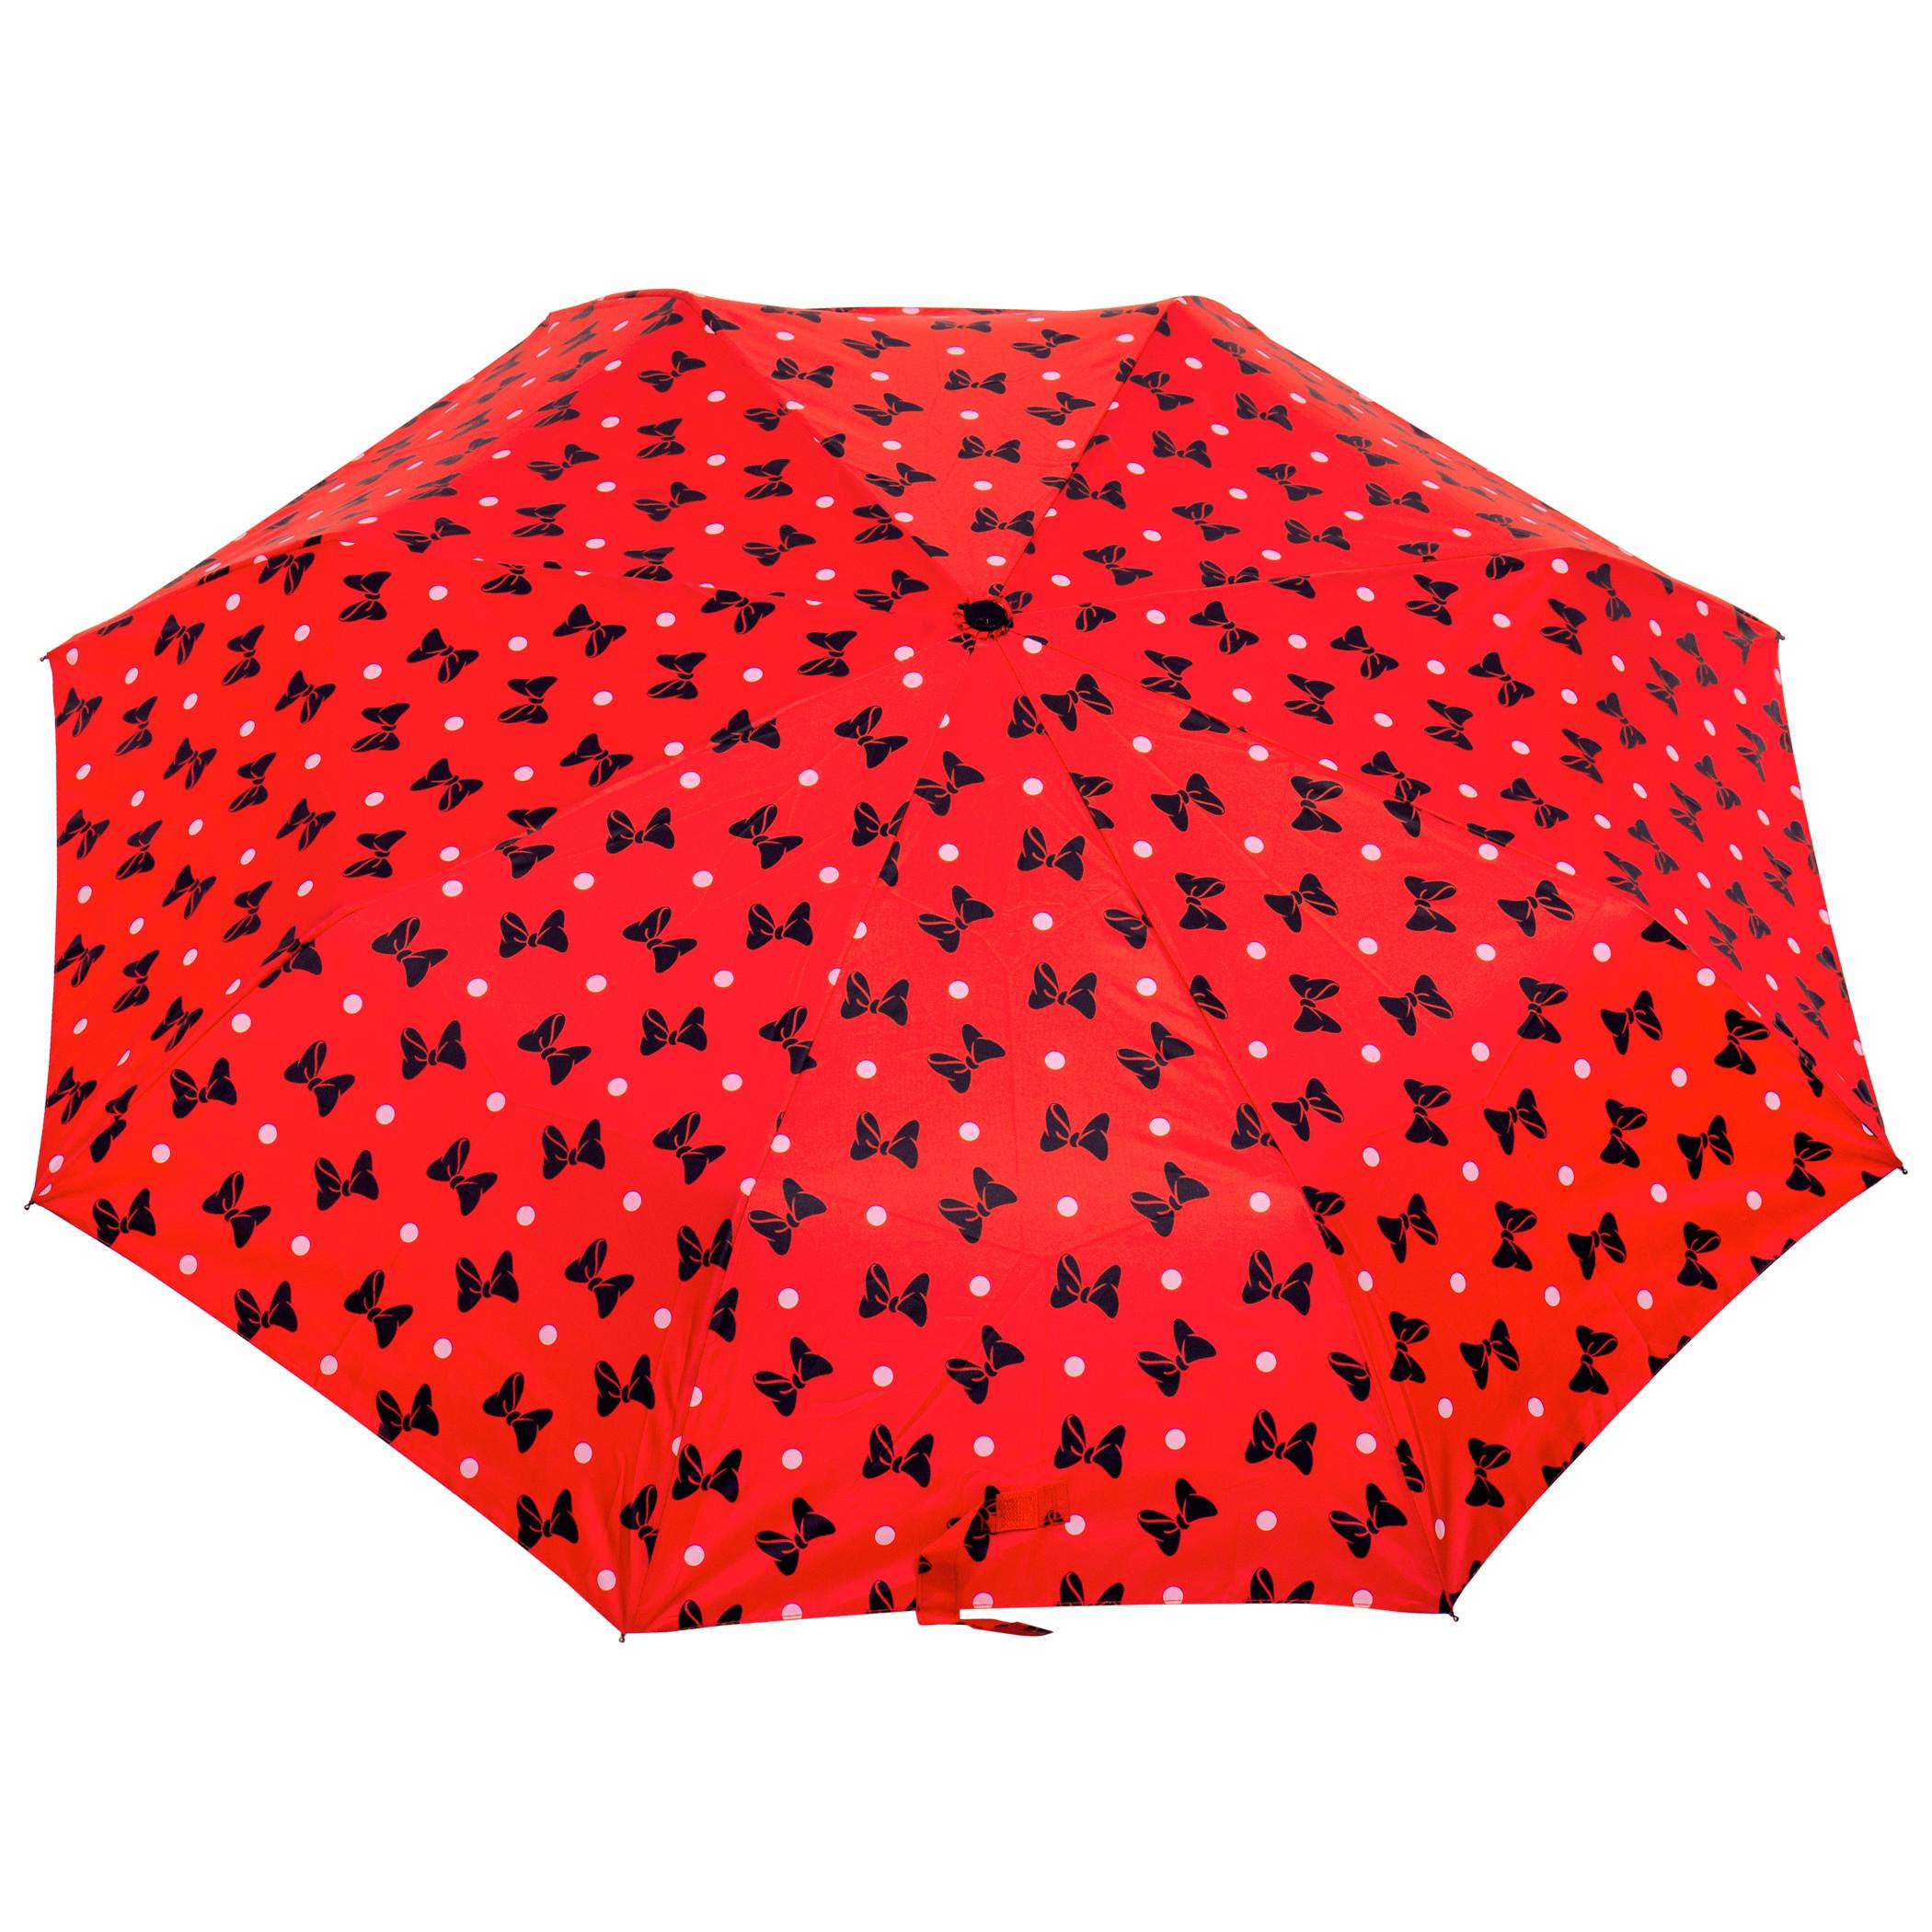 Disney Minnie Mouse Black Bow Umbrella